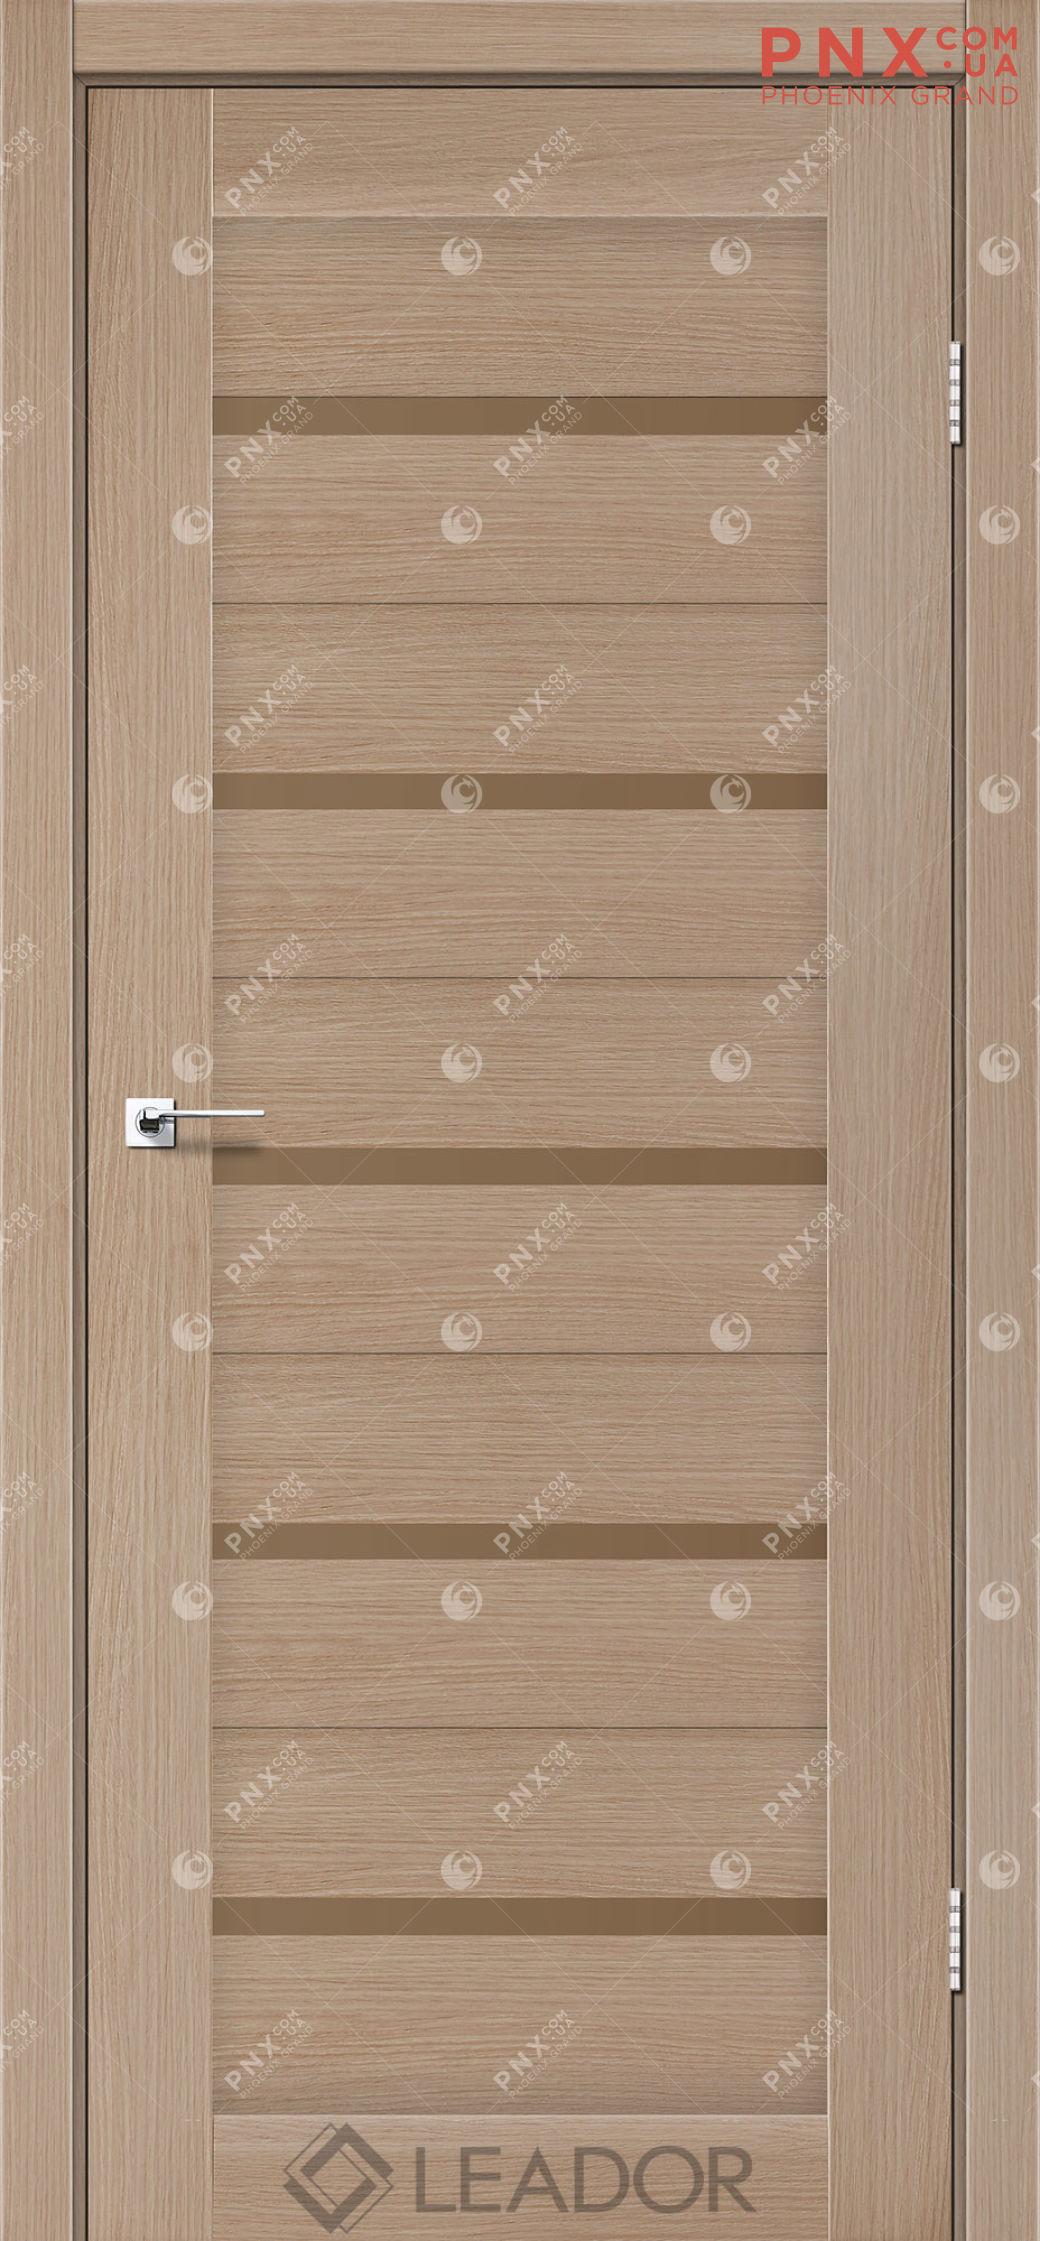 Межкомнатная дверь LEADOR Siena, Дуб Мокко, Стекло сатин бронза